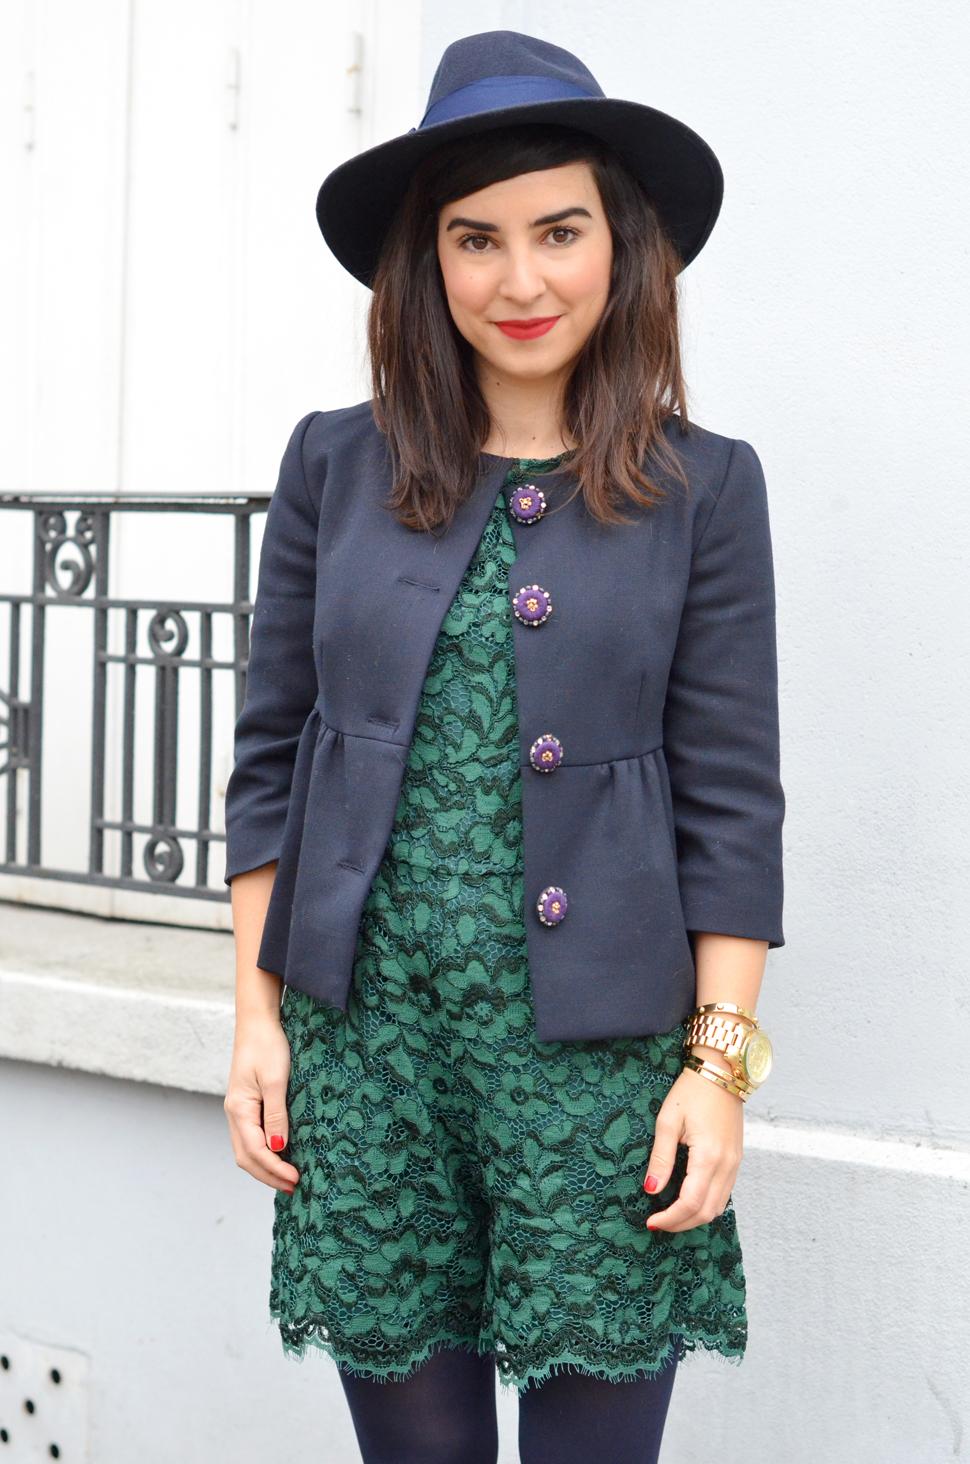 helloitsvalentine blogger parisien french hat fedora lace green blue Manoush Back To School jacket veste